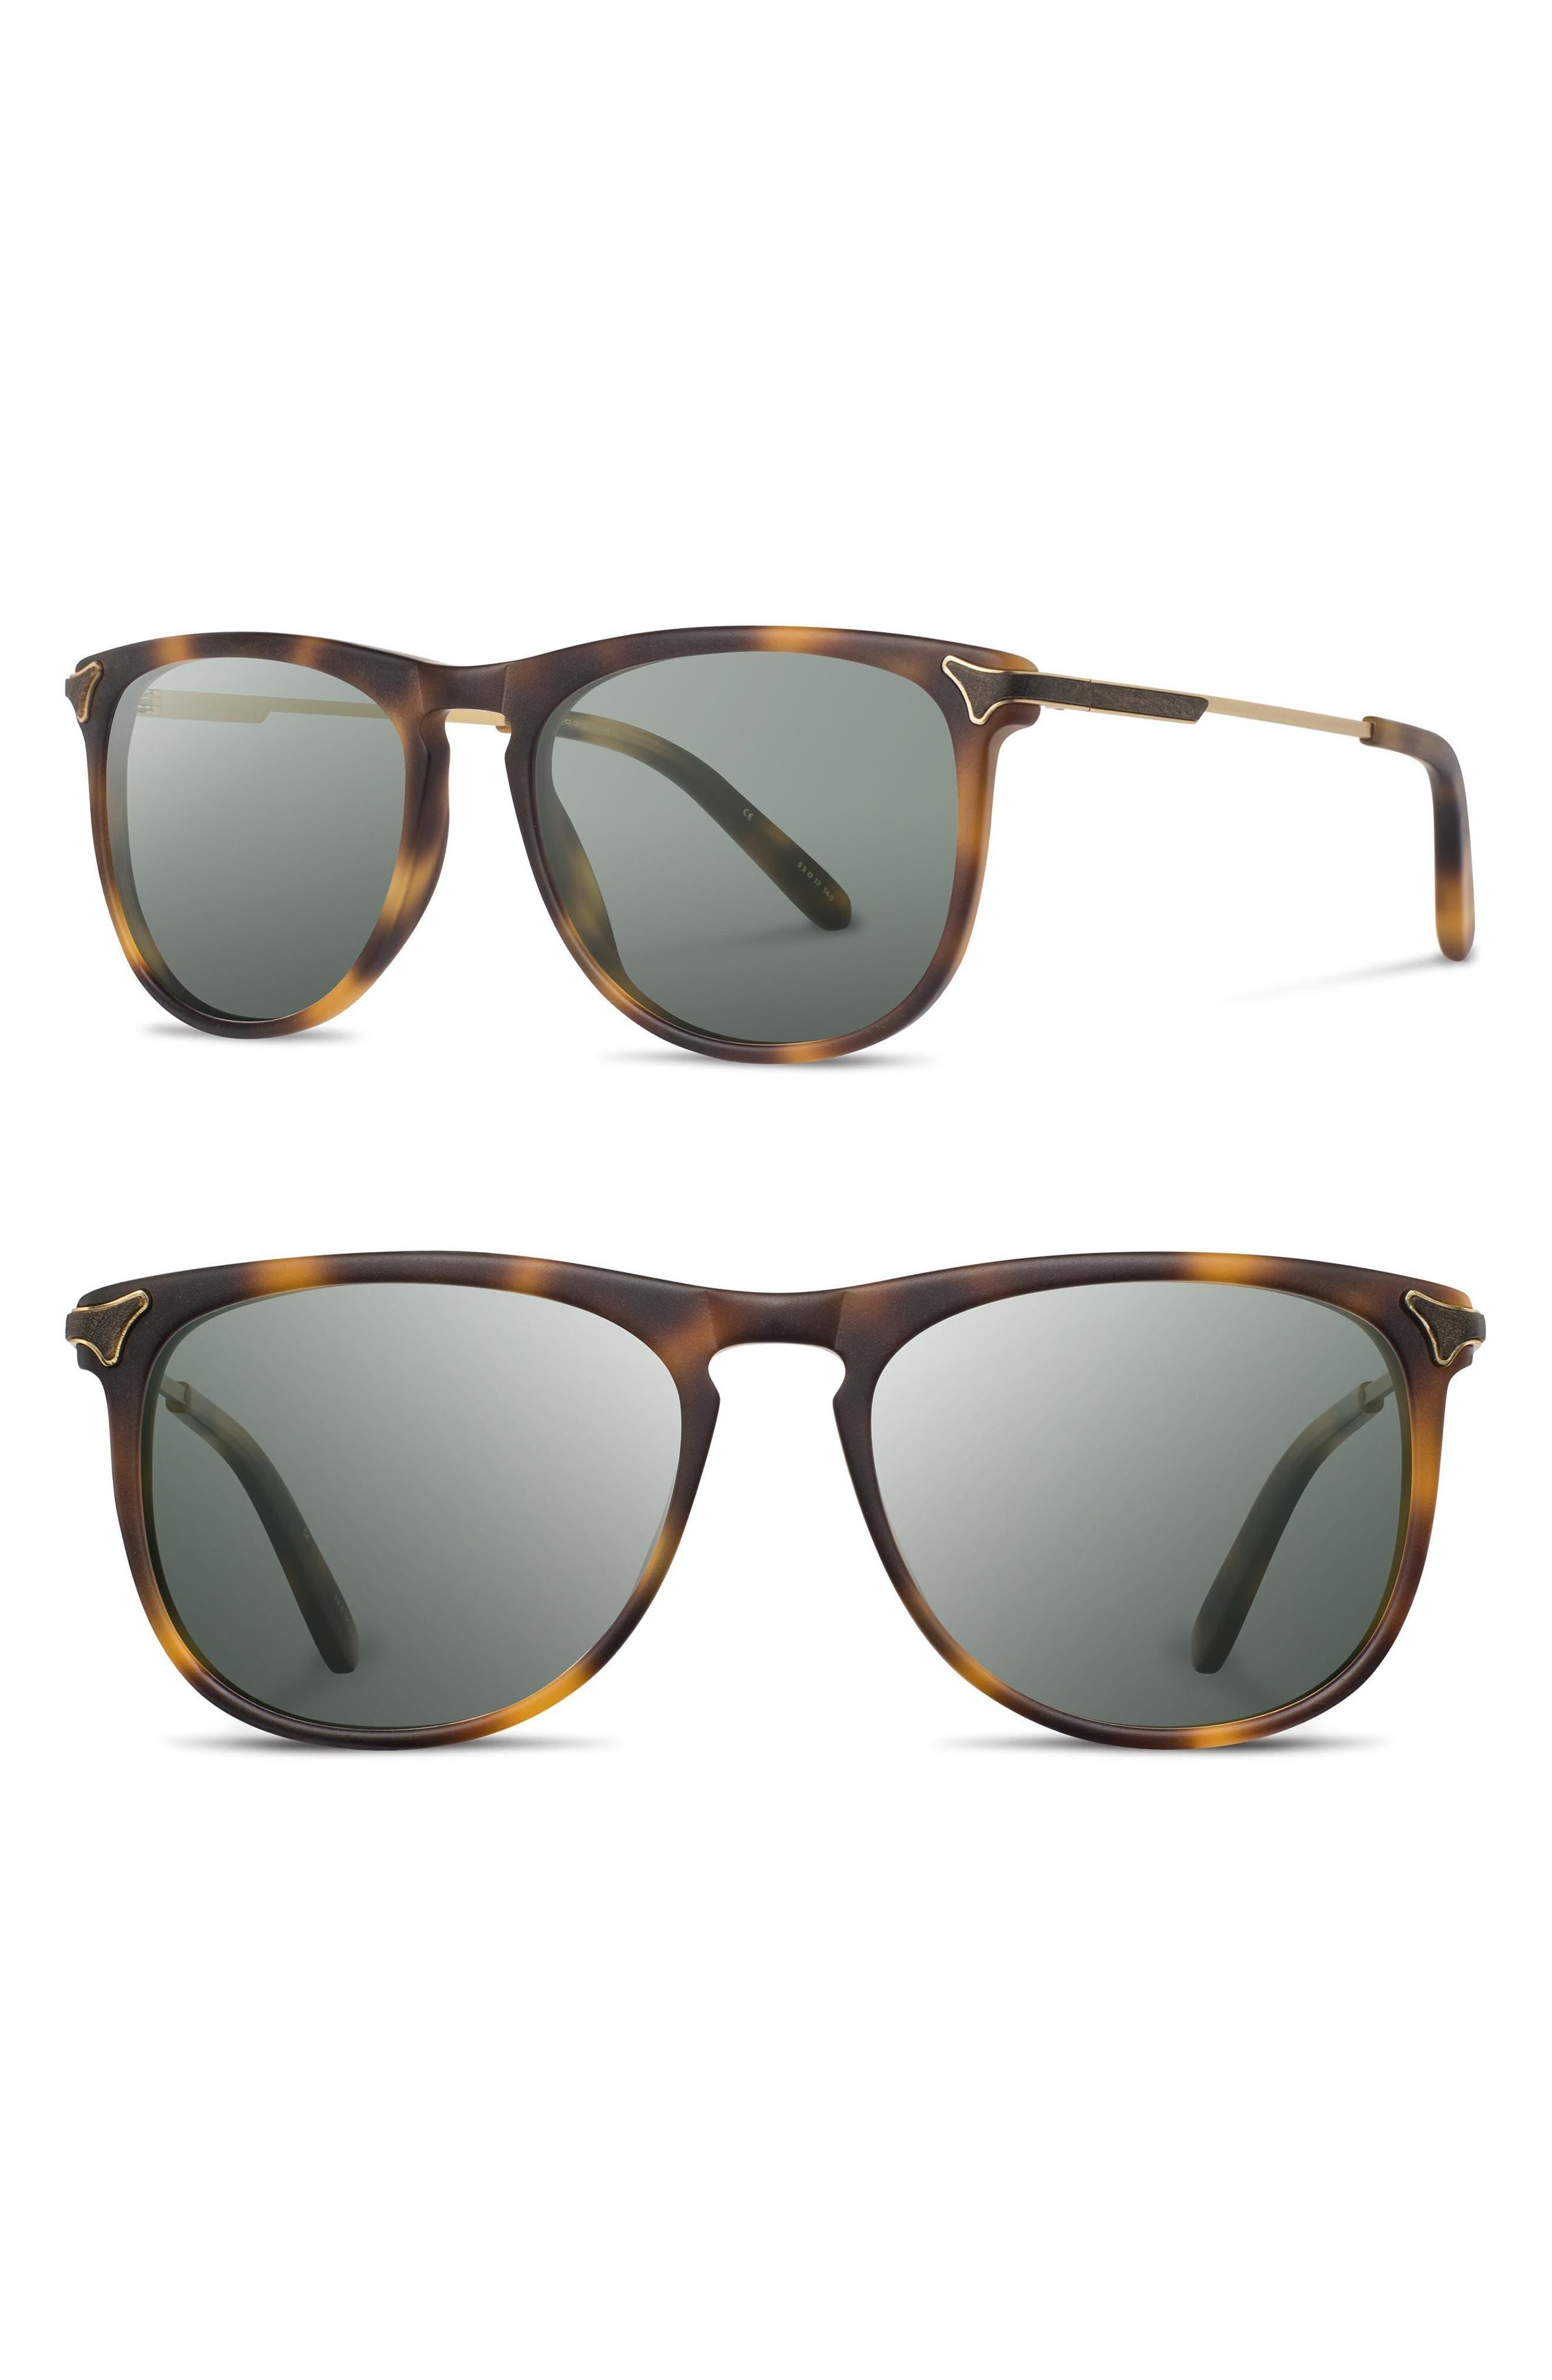 Keller 53mm Polarized Sunglasses,                         Main,                         color, Matte Brindle/ G15 Polar